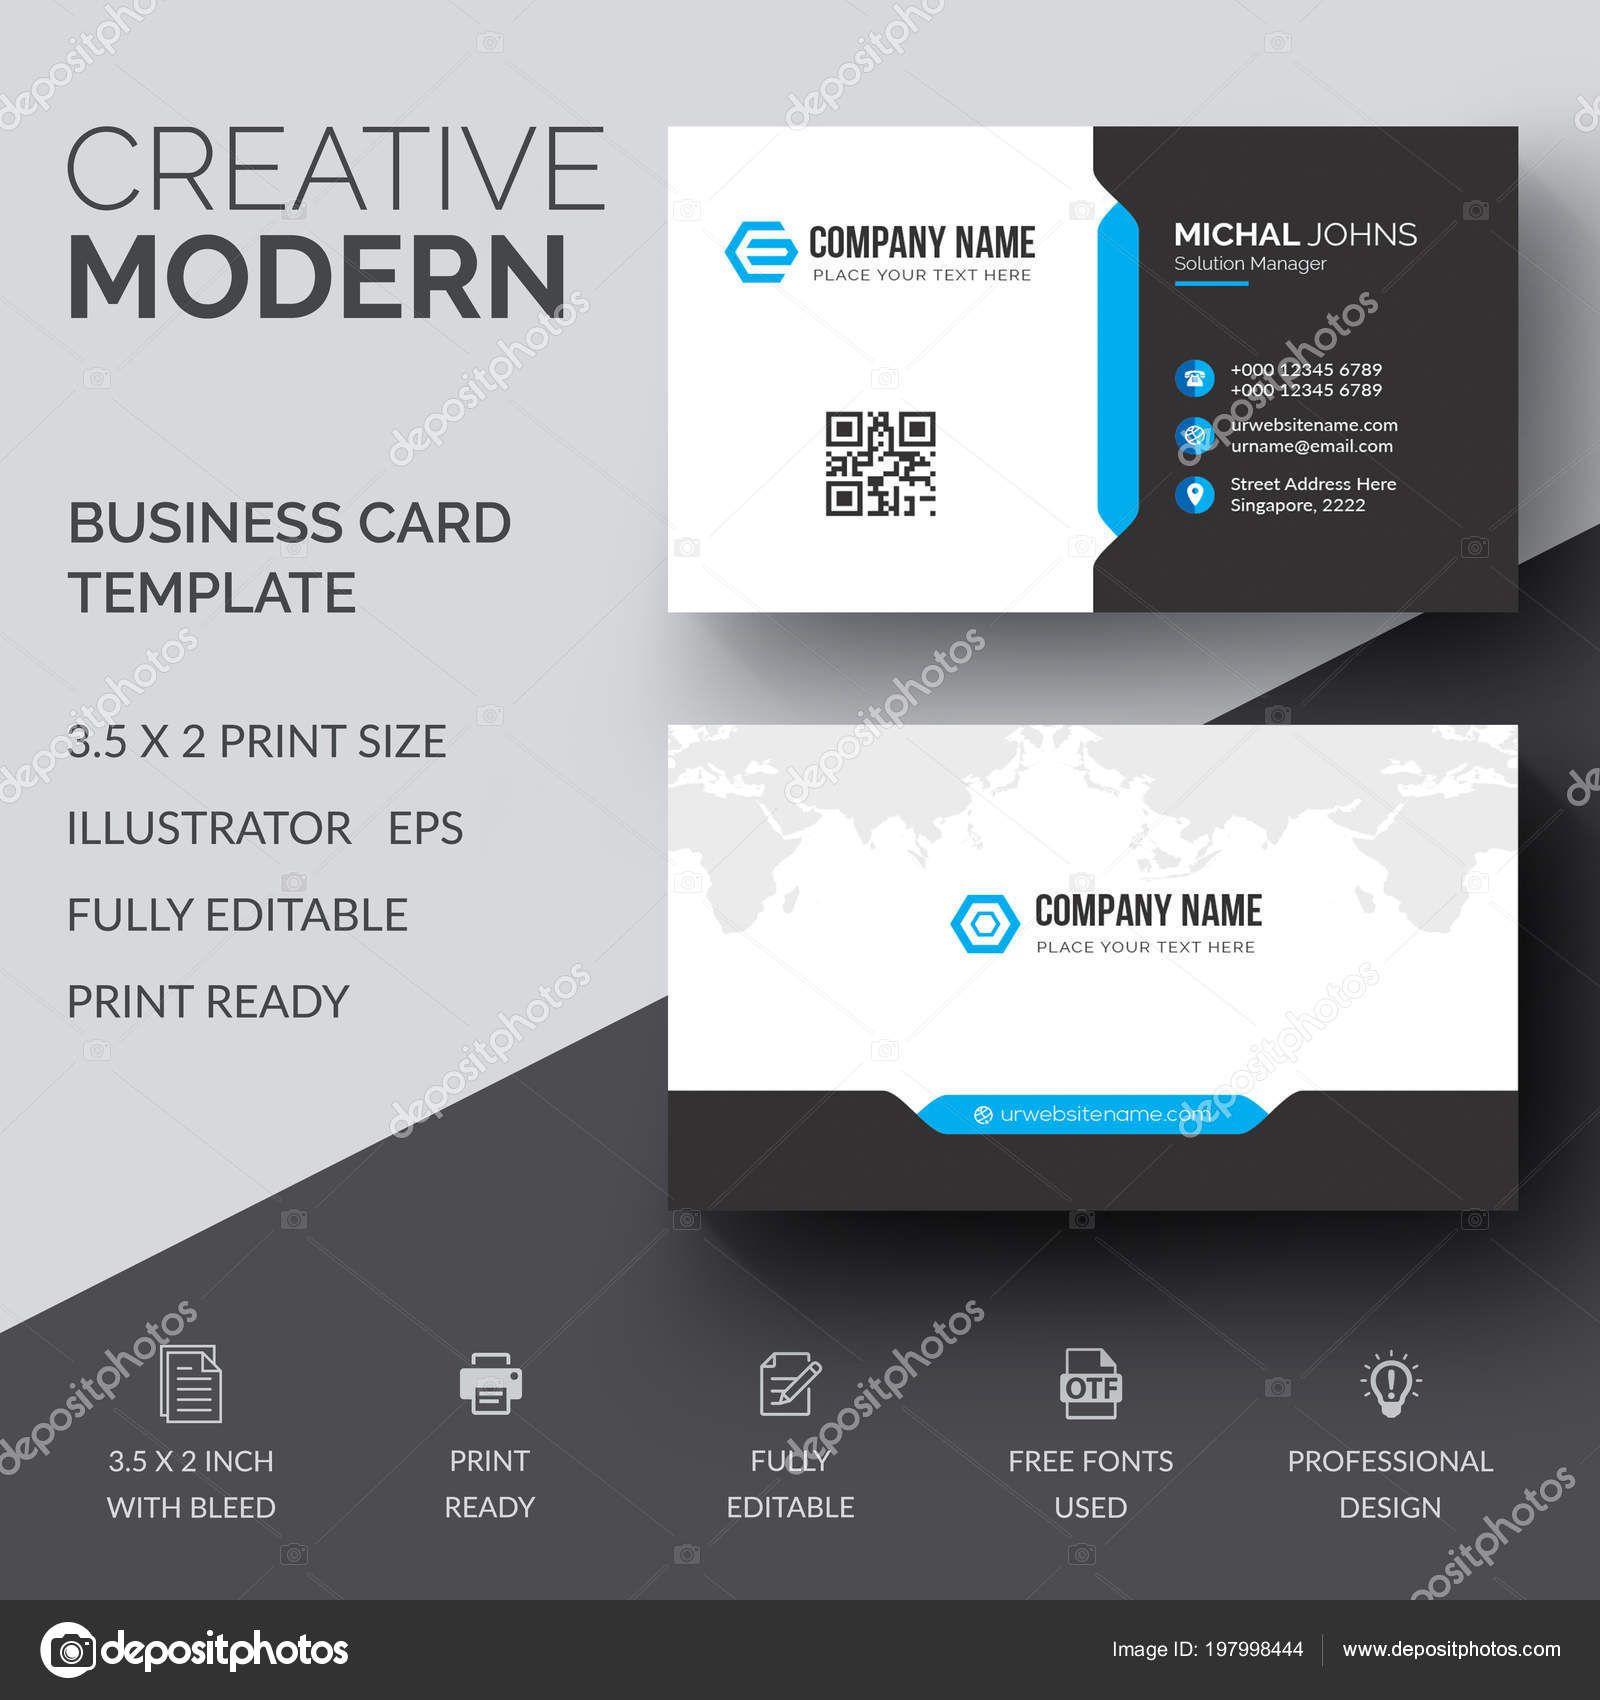 Download Vector Design Modern Creative Clean Business Card